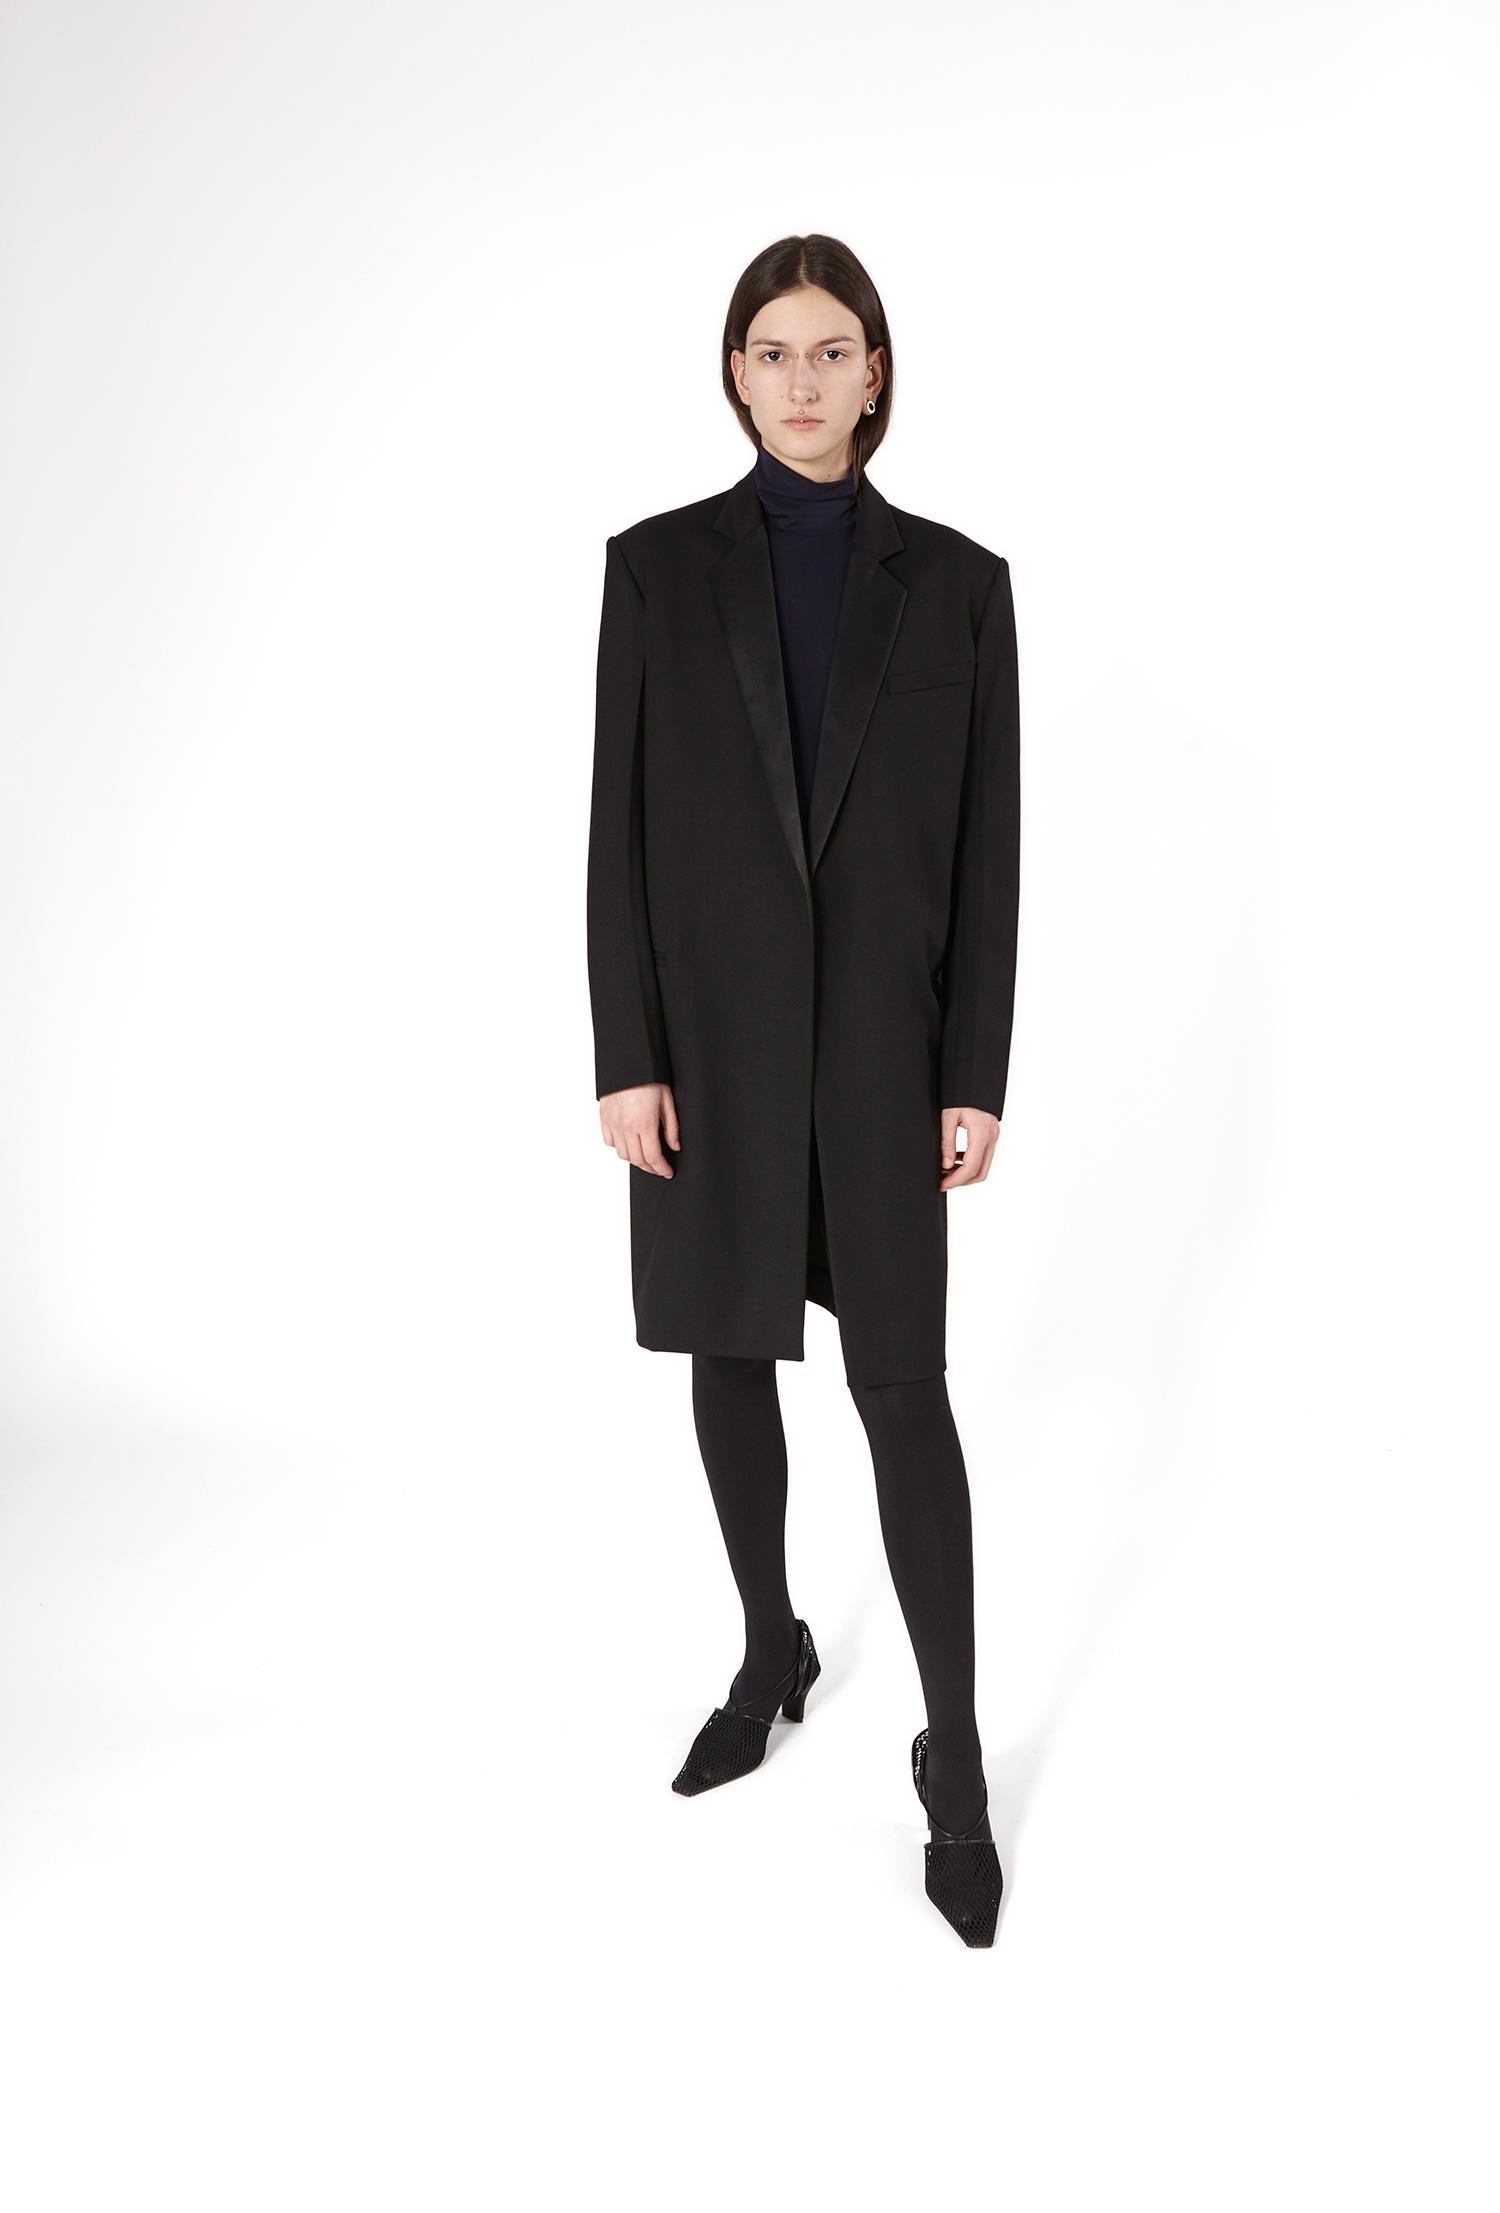 Top ROSELINE Coat RITHA